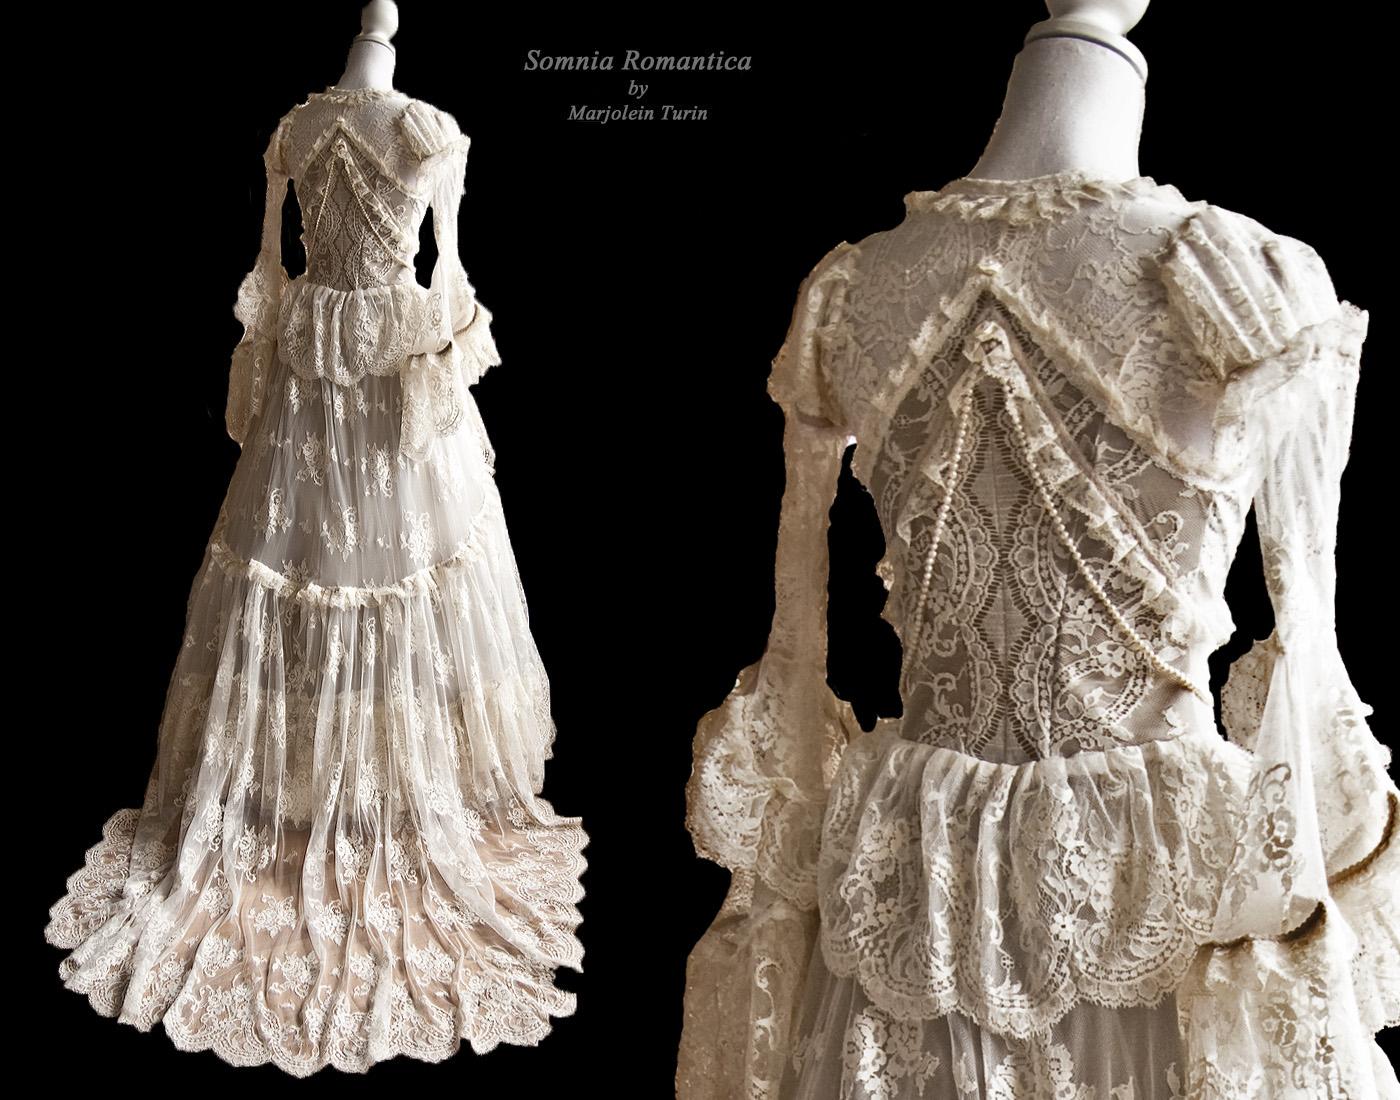 Bridal dress, back view, by Somnia Romantica by SomniaRomantica